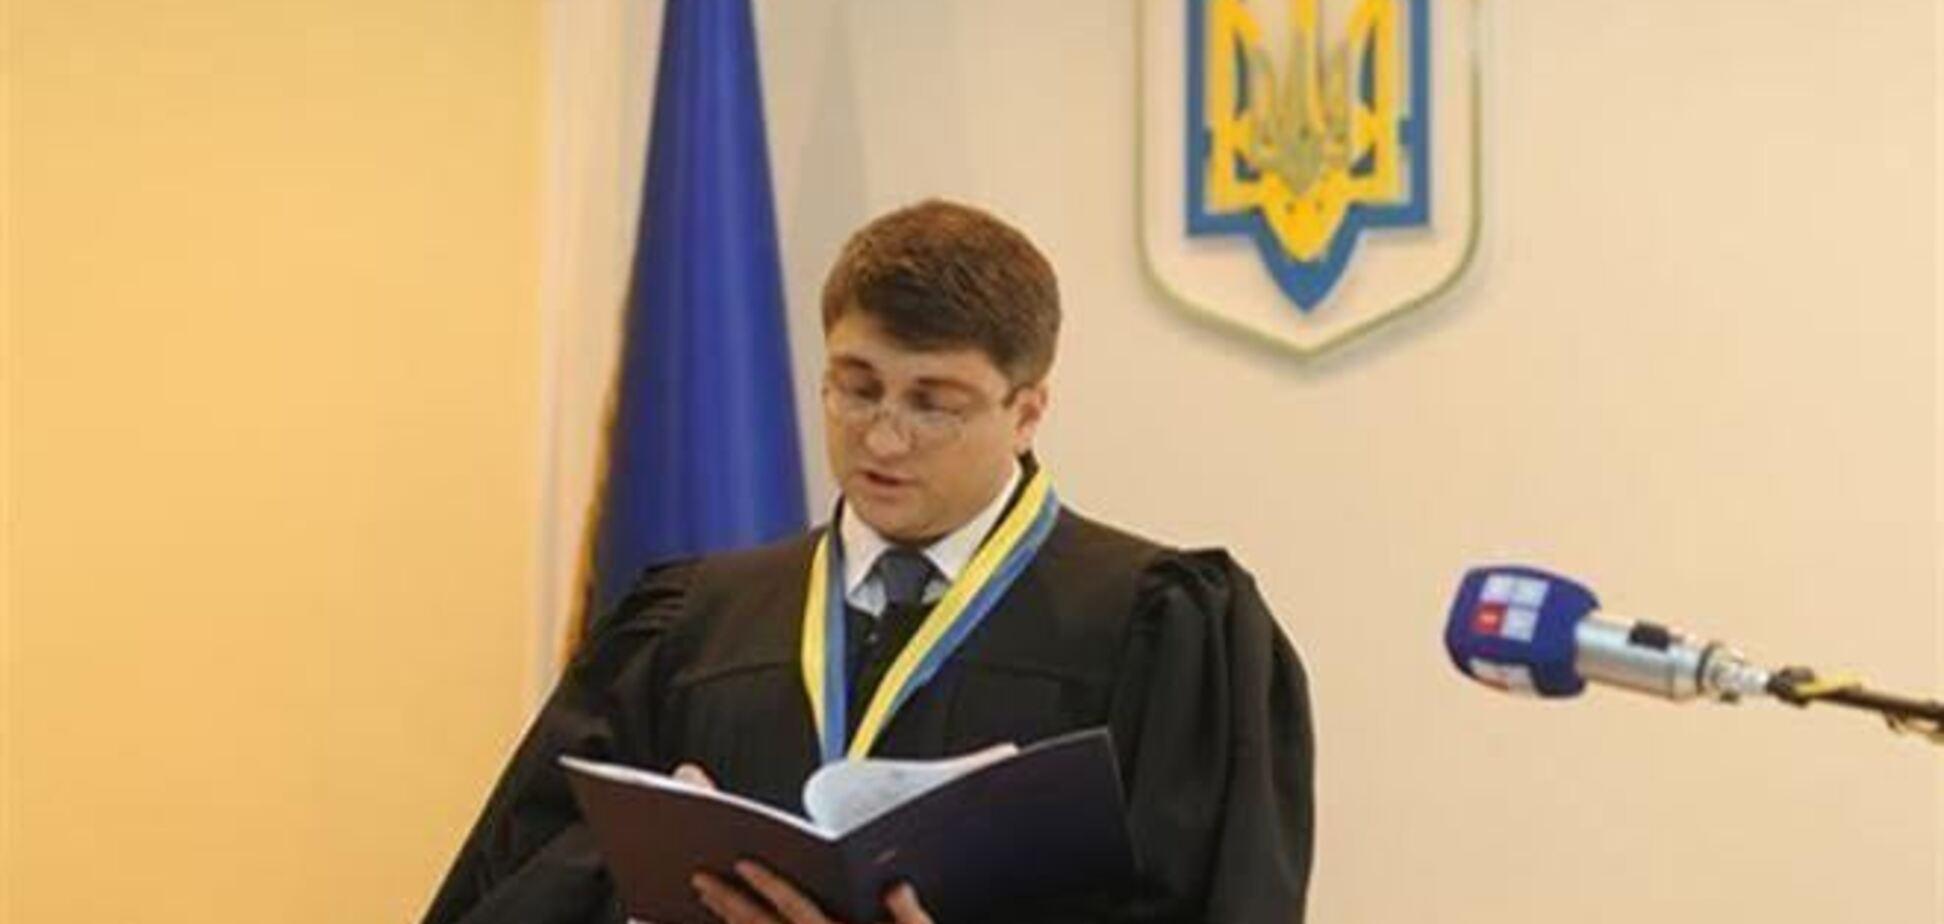 Против приговорившего Тимошенко судьи возбудили дело